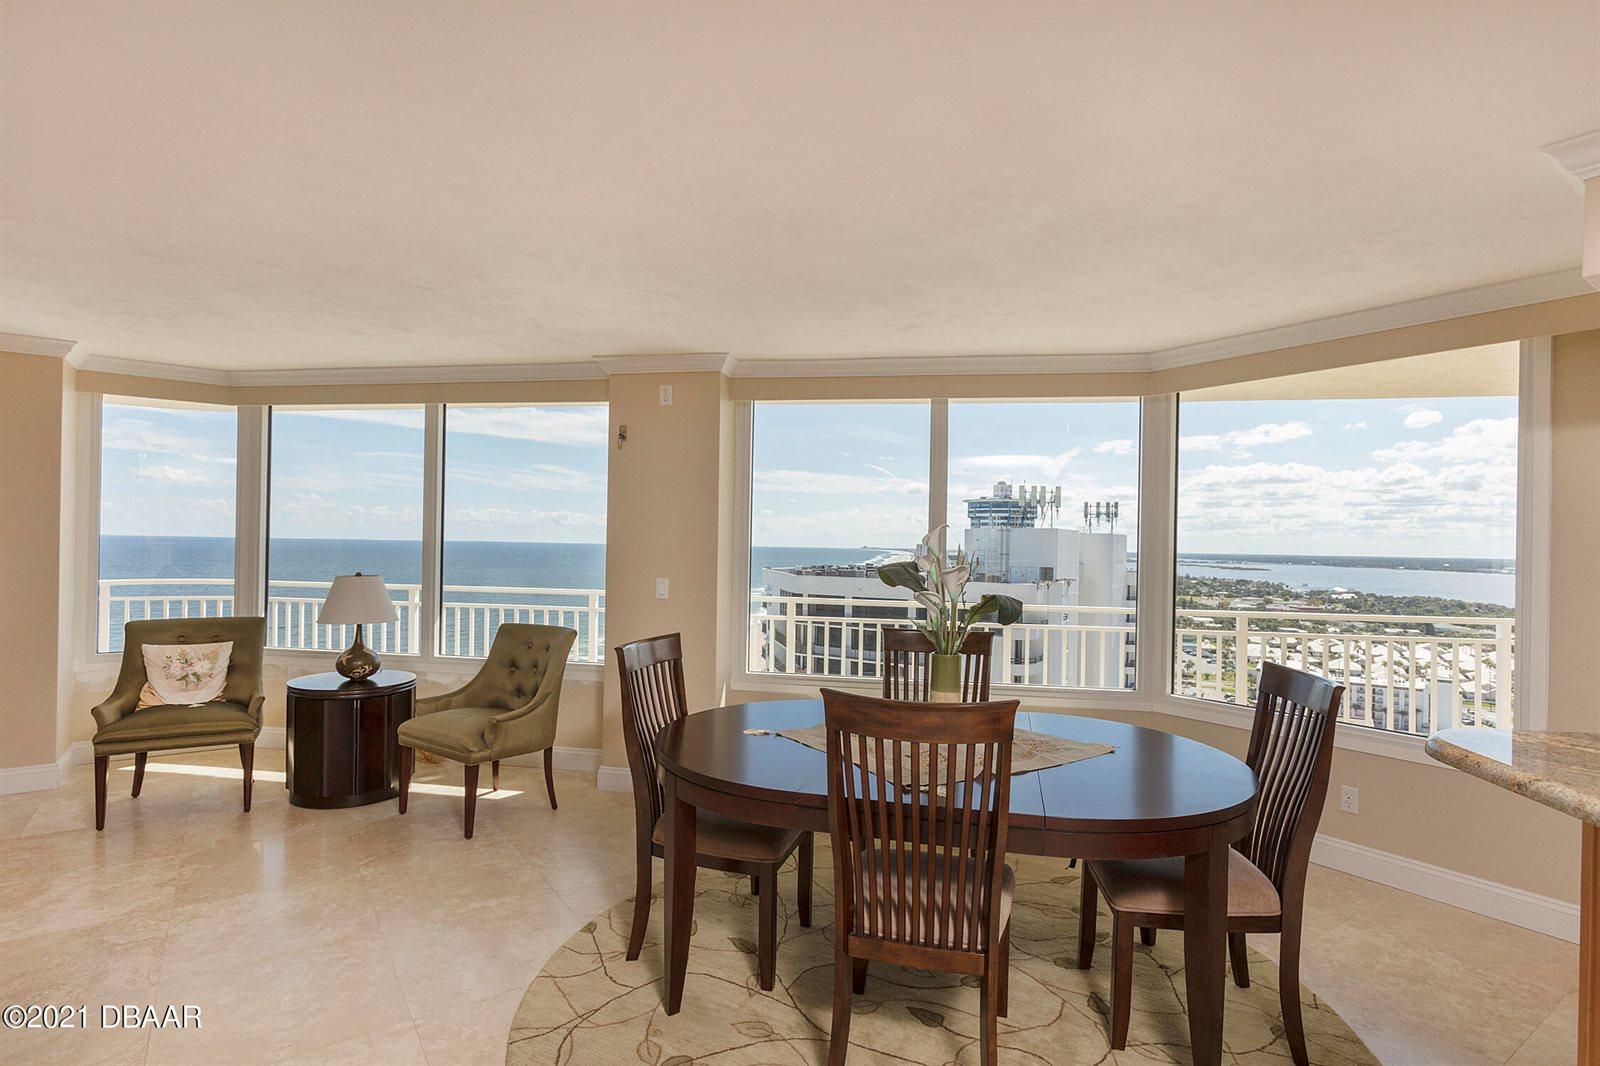 2545 Atlantic Avenue, #2207-2208, Daytona Beach Shores, FL 32118